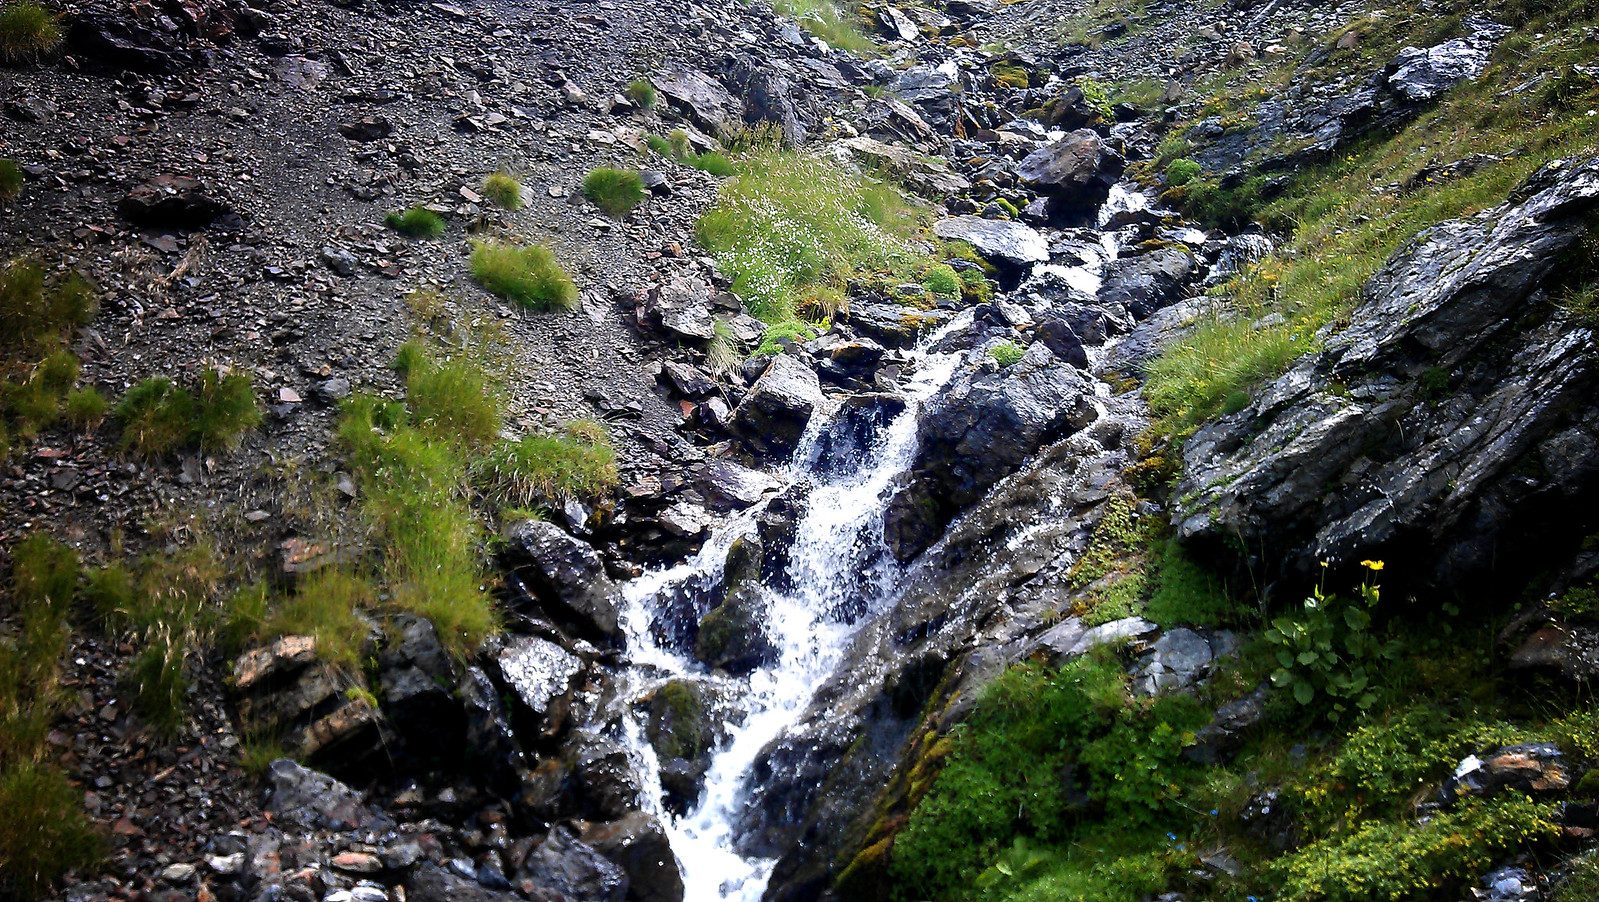 Vertical Cabanera: Montsent de Pallars